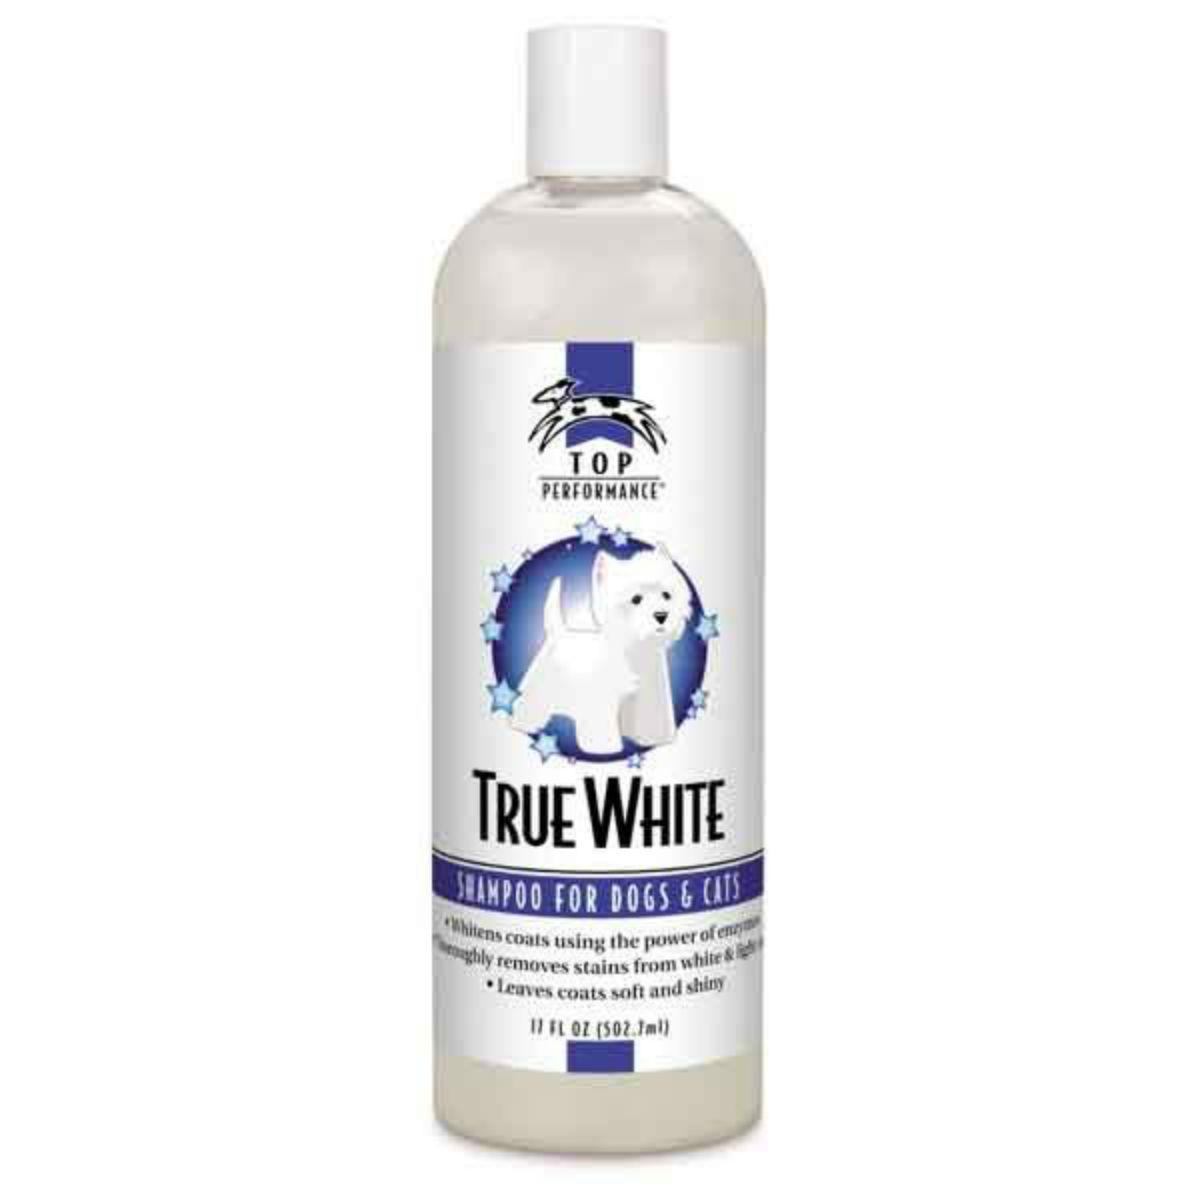 Top Performance Pet Shampoo - True White